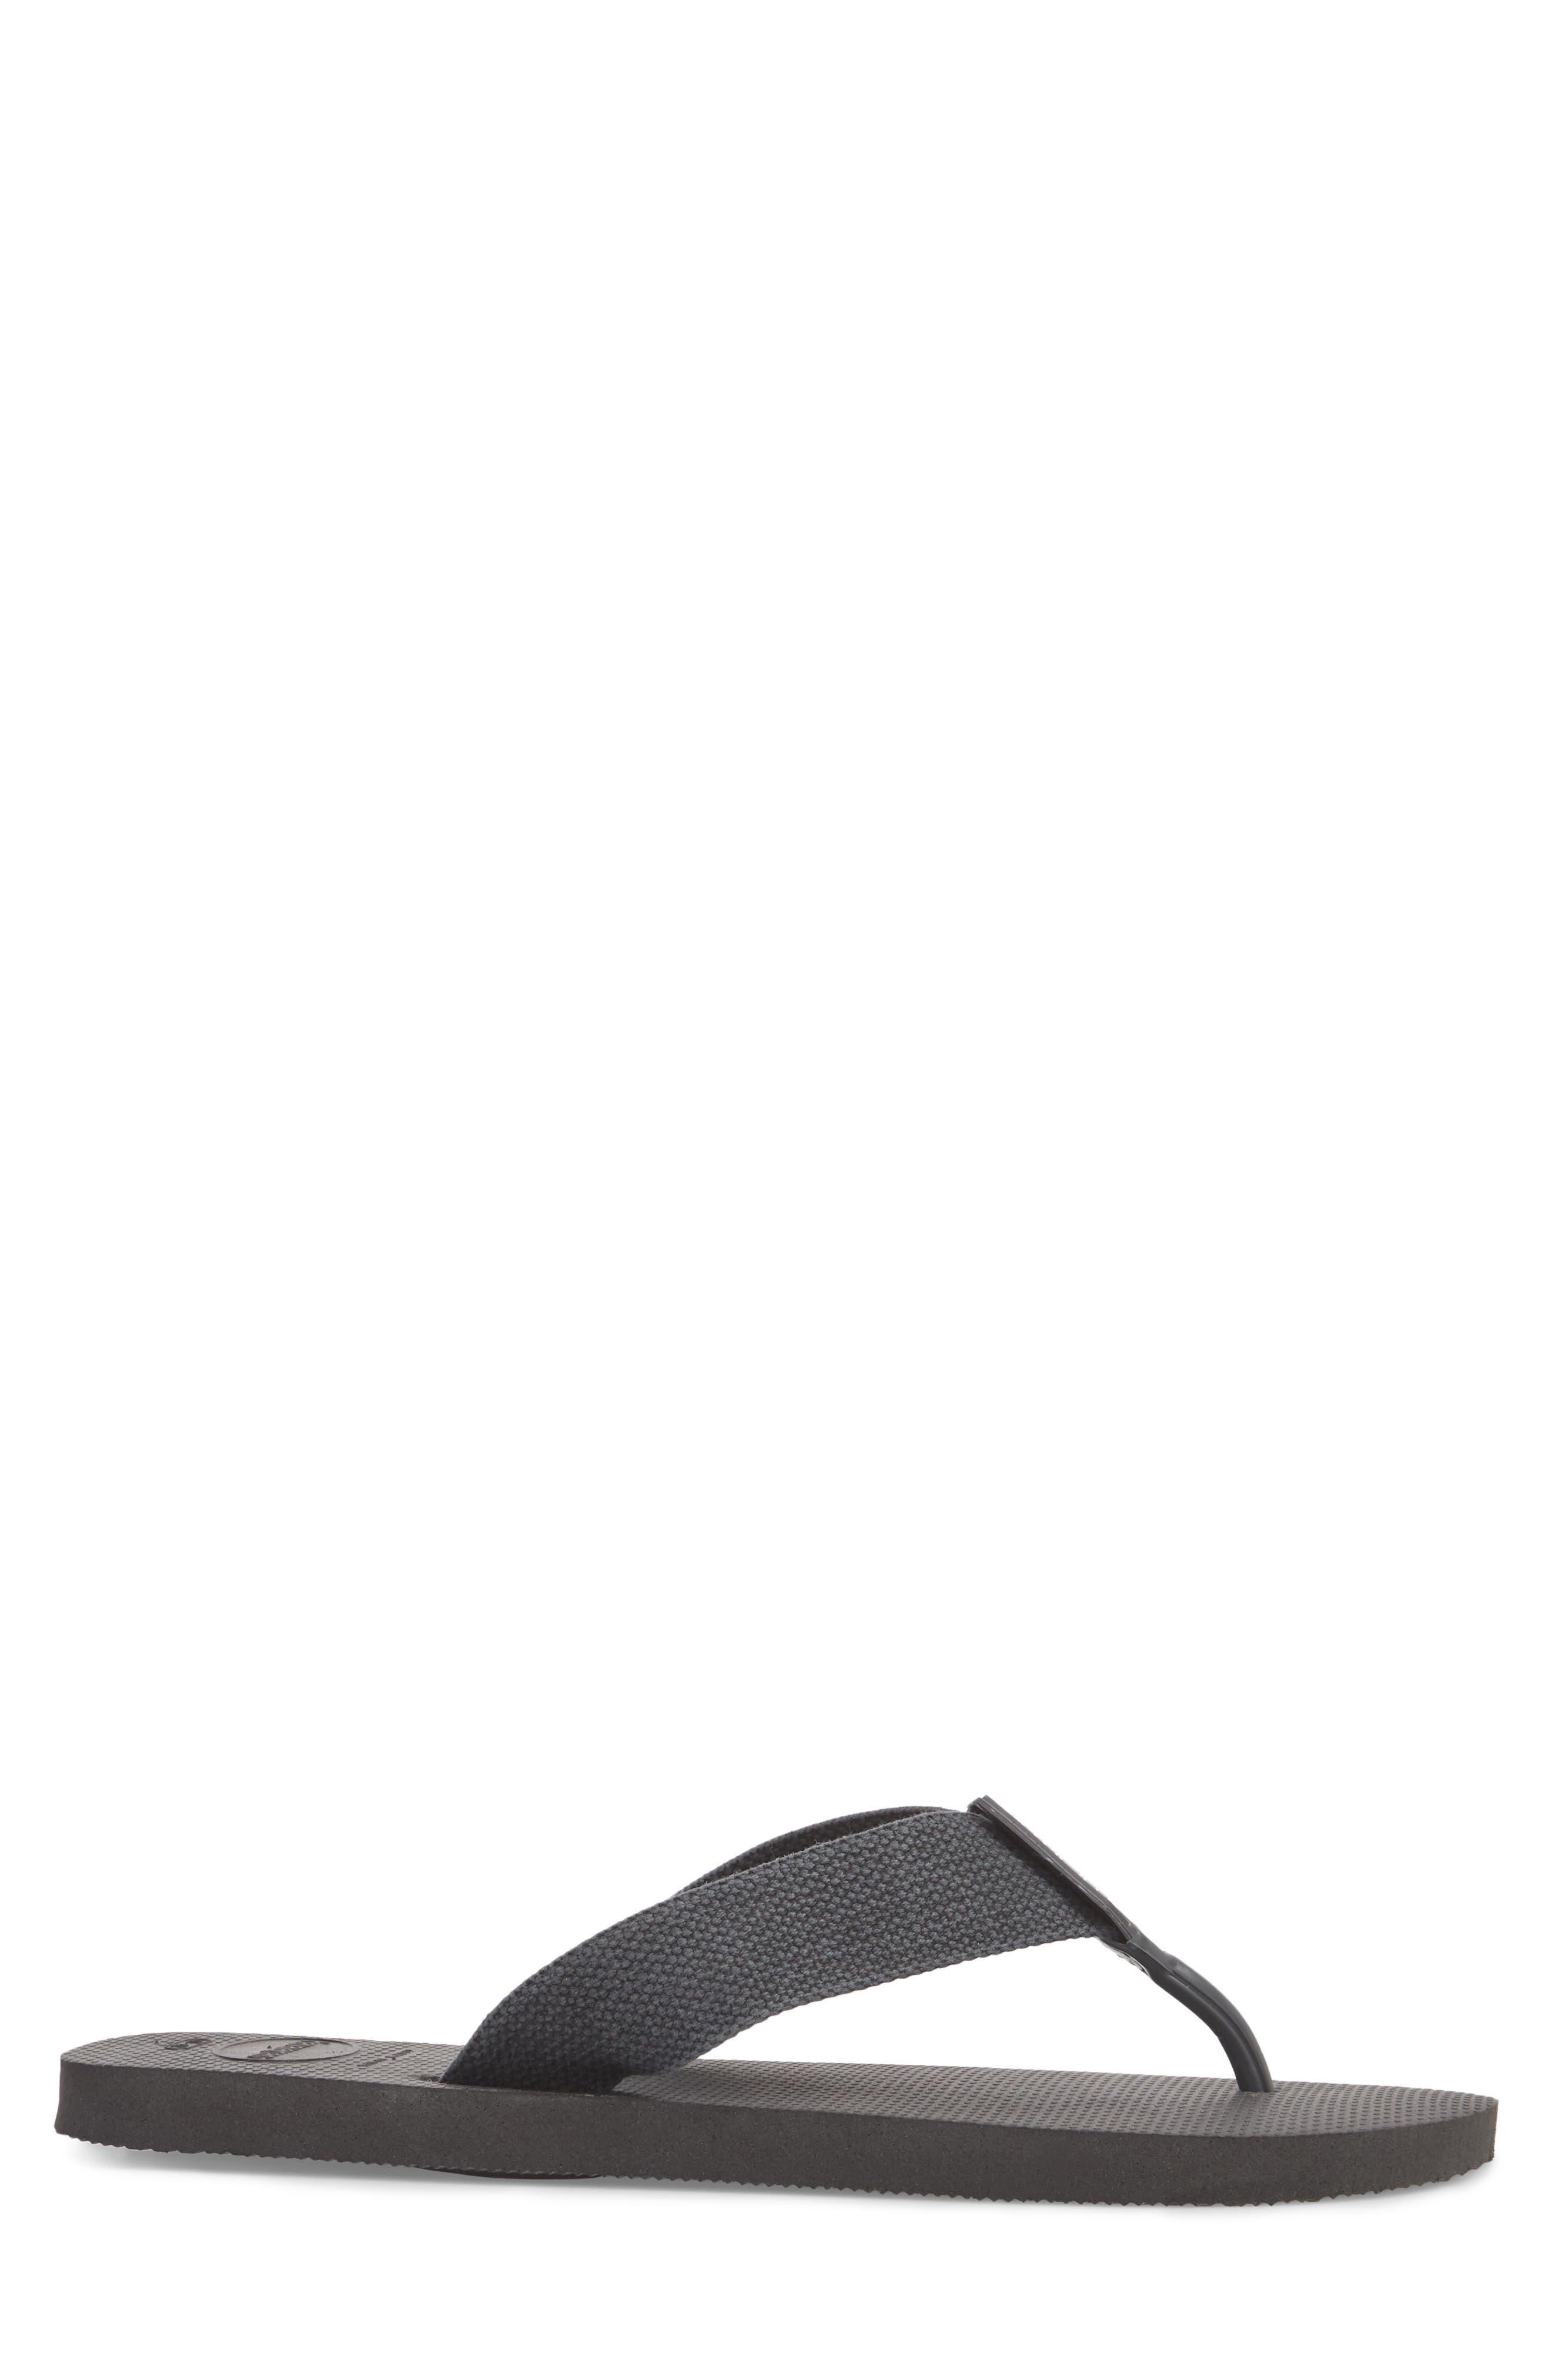 Havianas 'Urban Basic' Flip Flop,                             Alternate thumbnail 13, color,